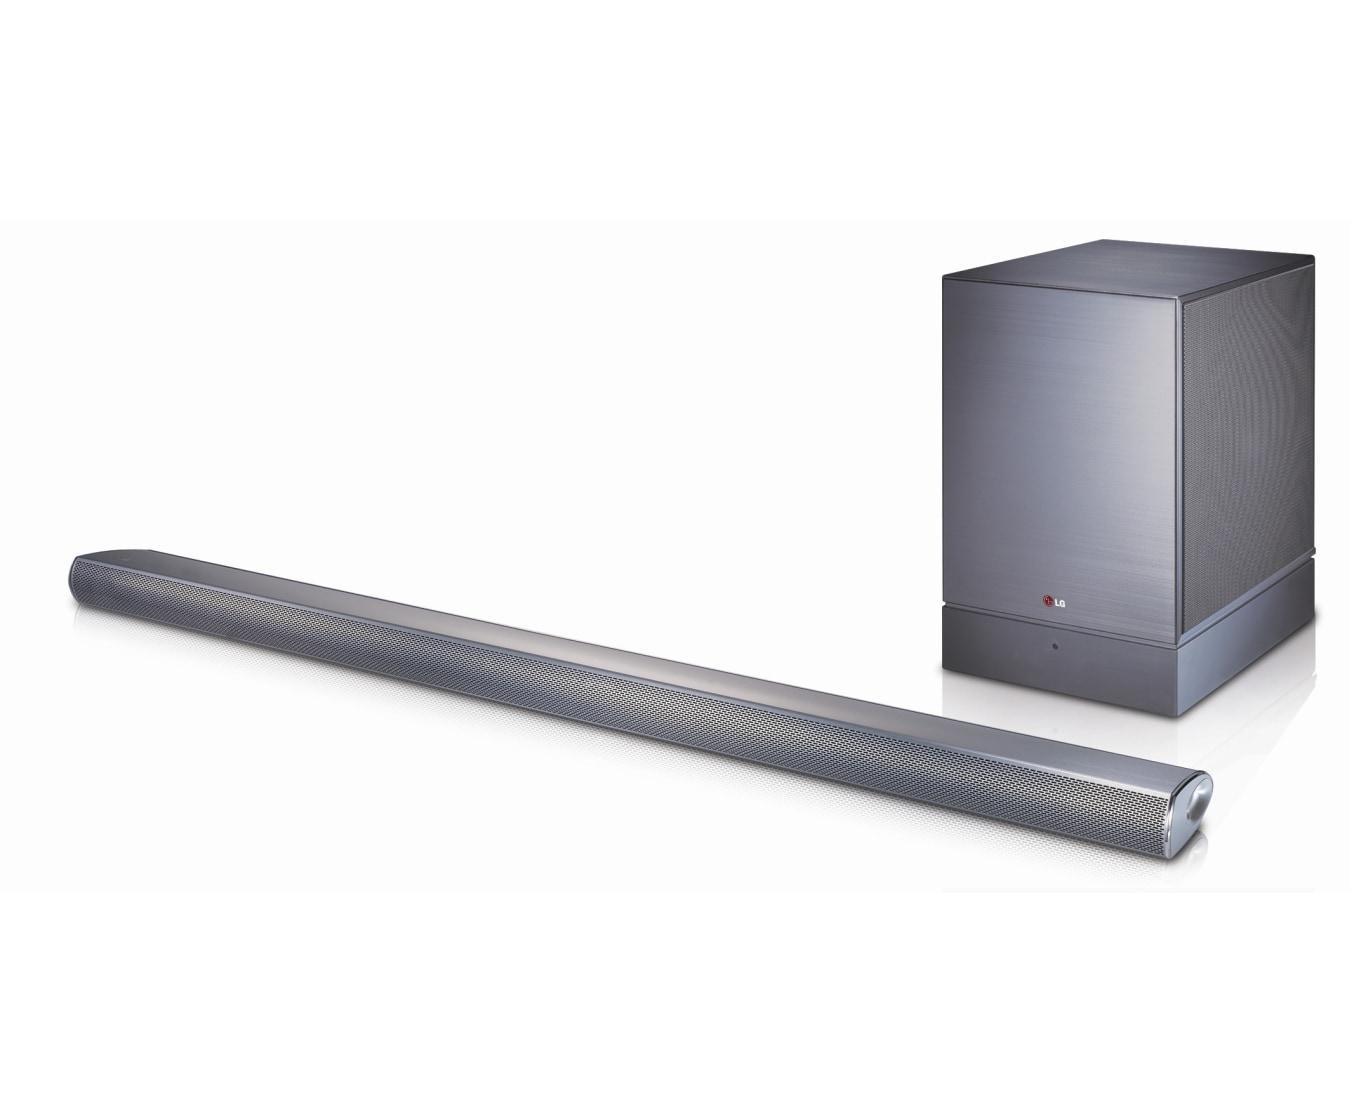 NB4540 - 4 1ch Sound Bar - 320W Total RMS Power Output | LG Australia